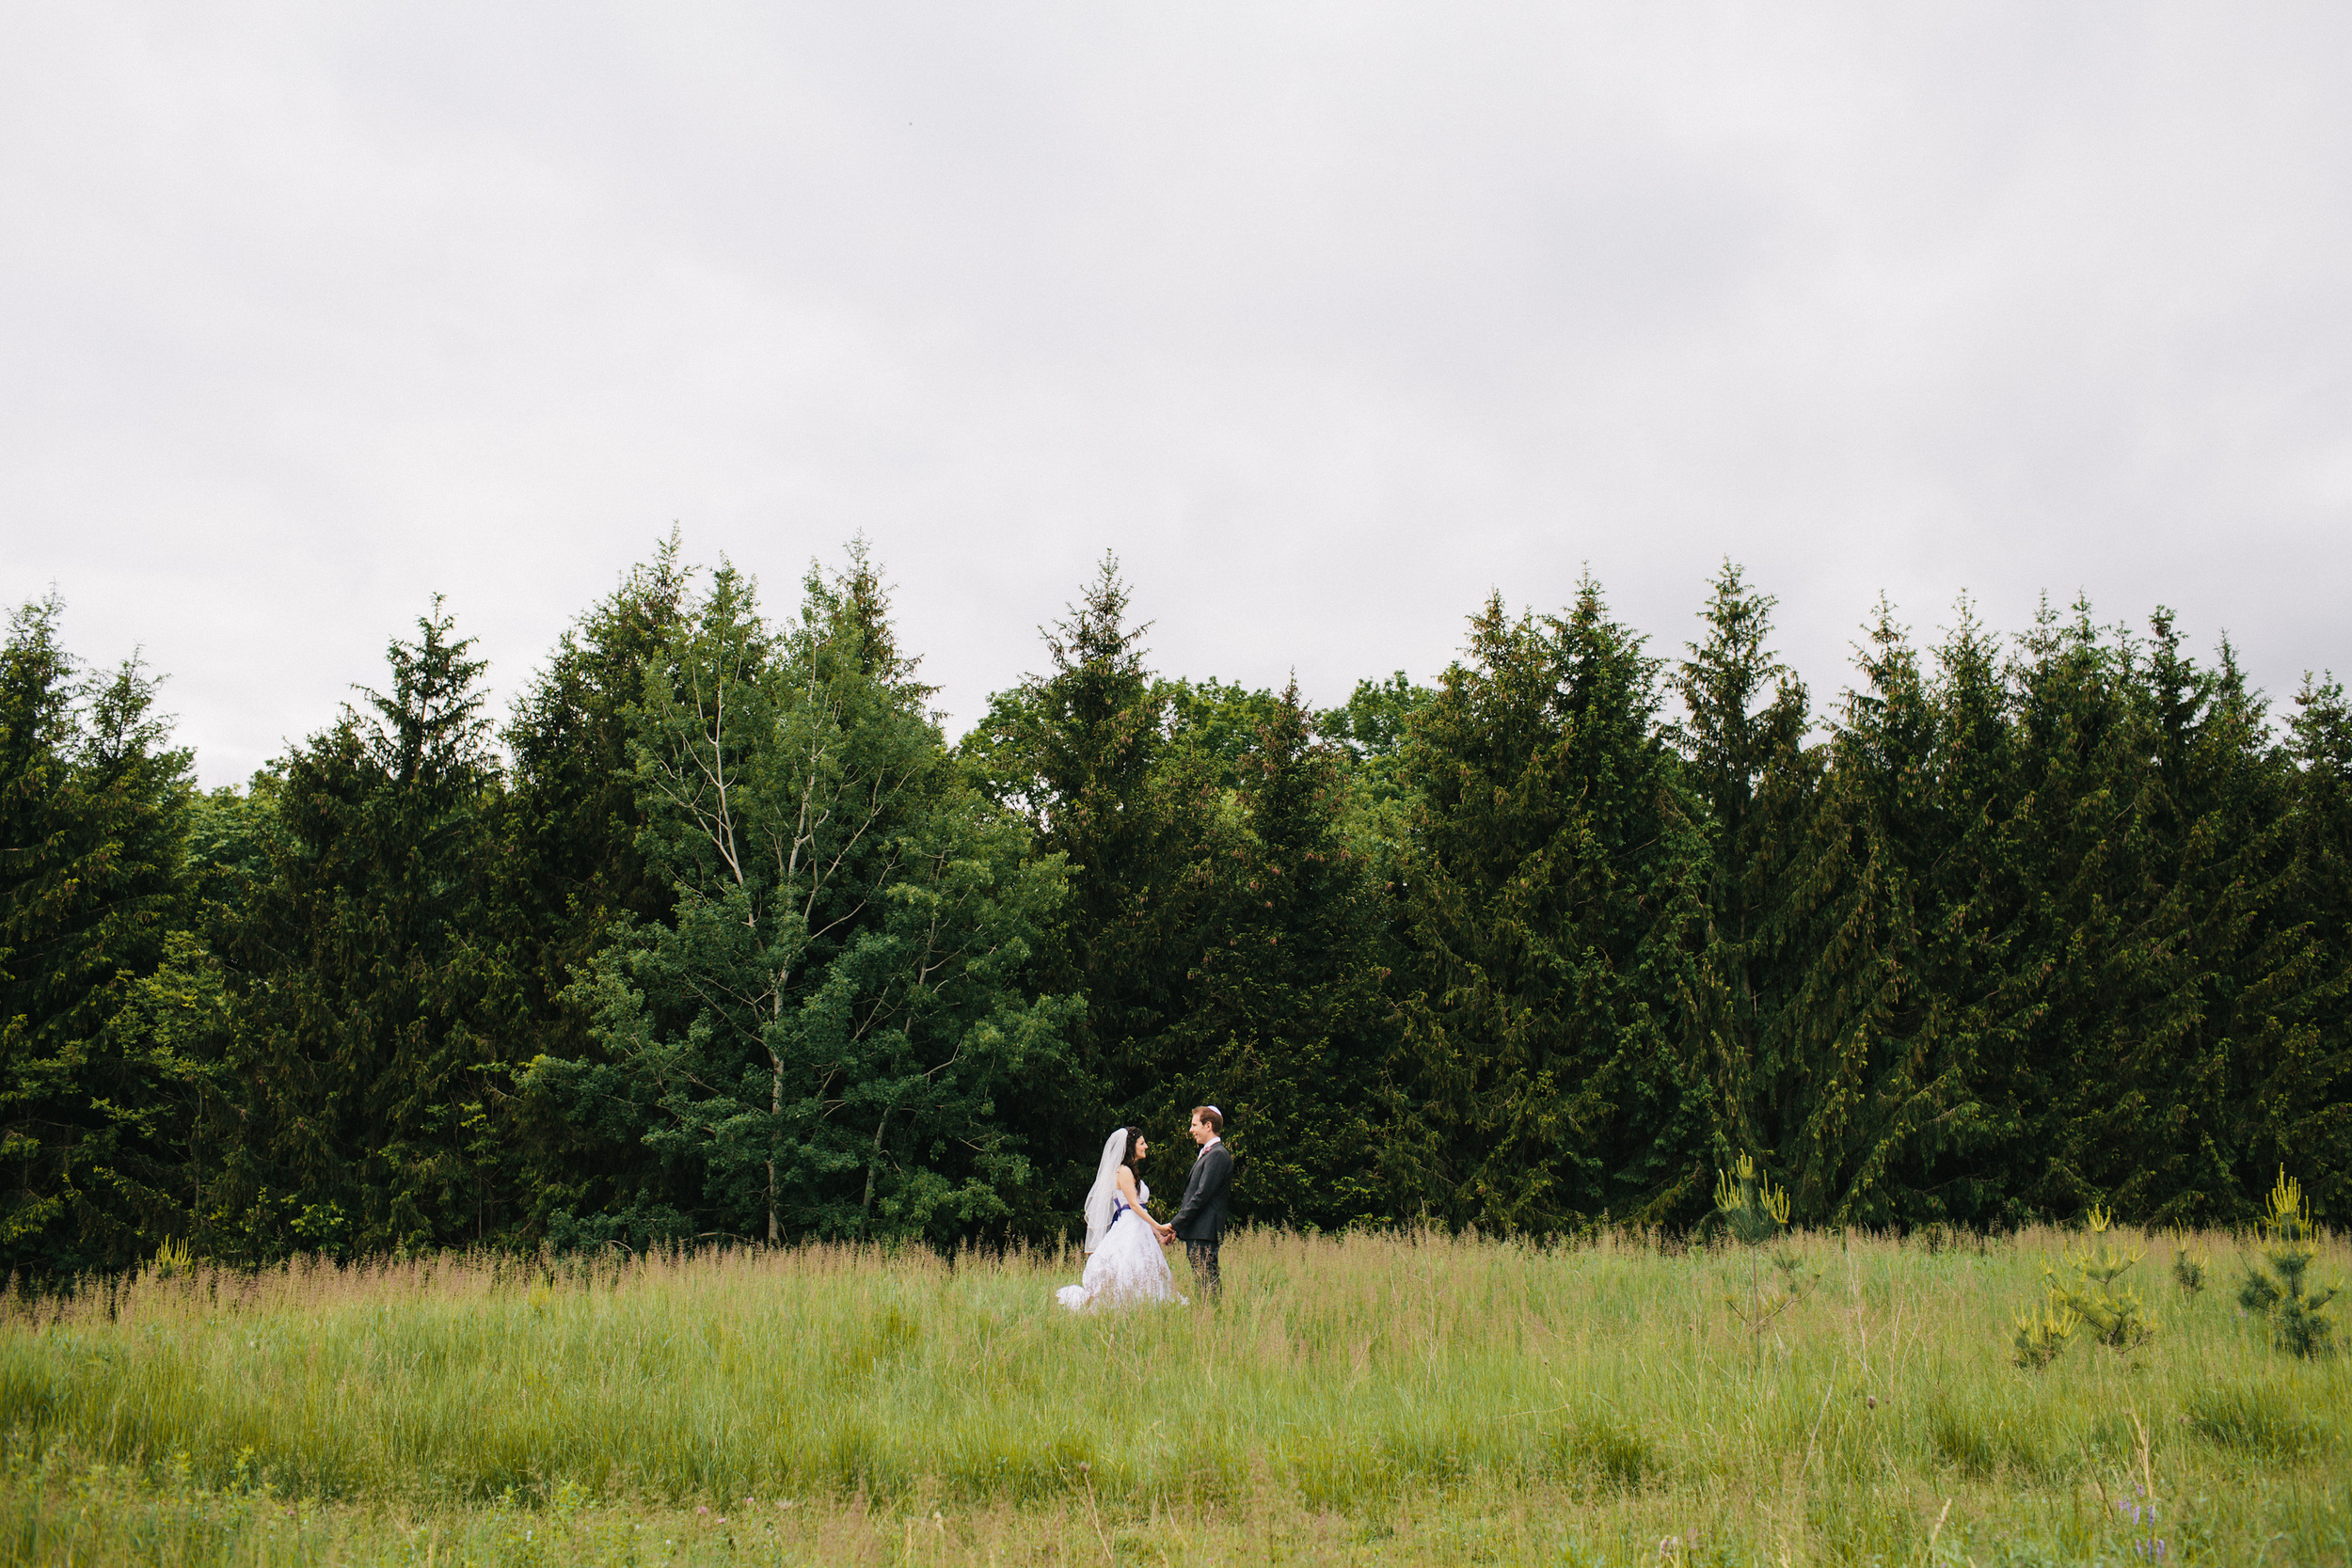 michael-rousseau-photography-kortwright-centre-wedding032.jpg